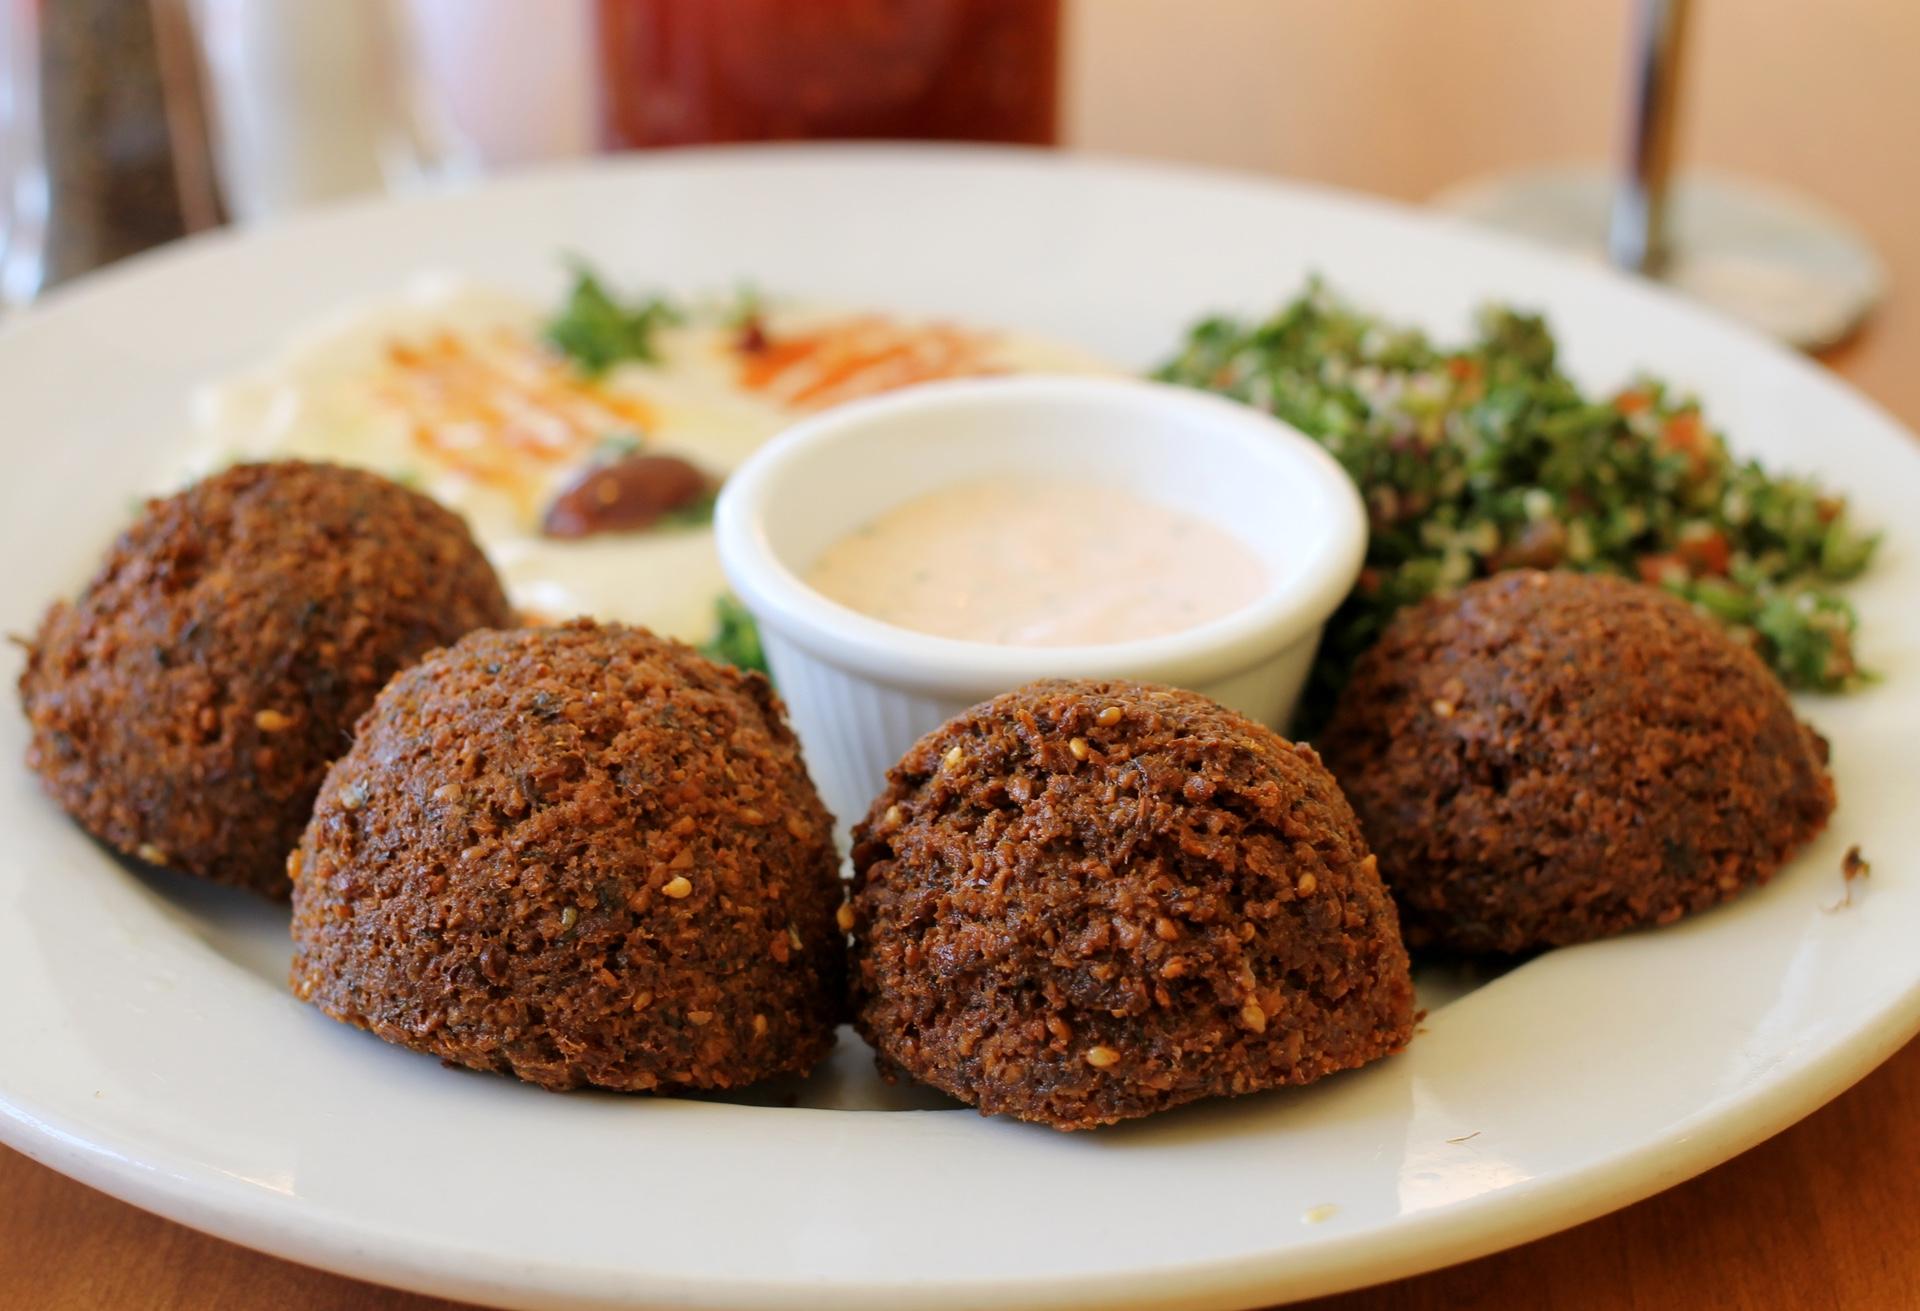 Falafel, hummus and tabouli salad at Kobani in Berkeley.